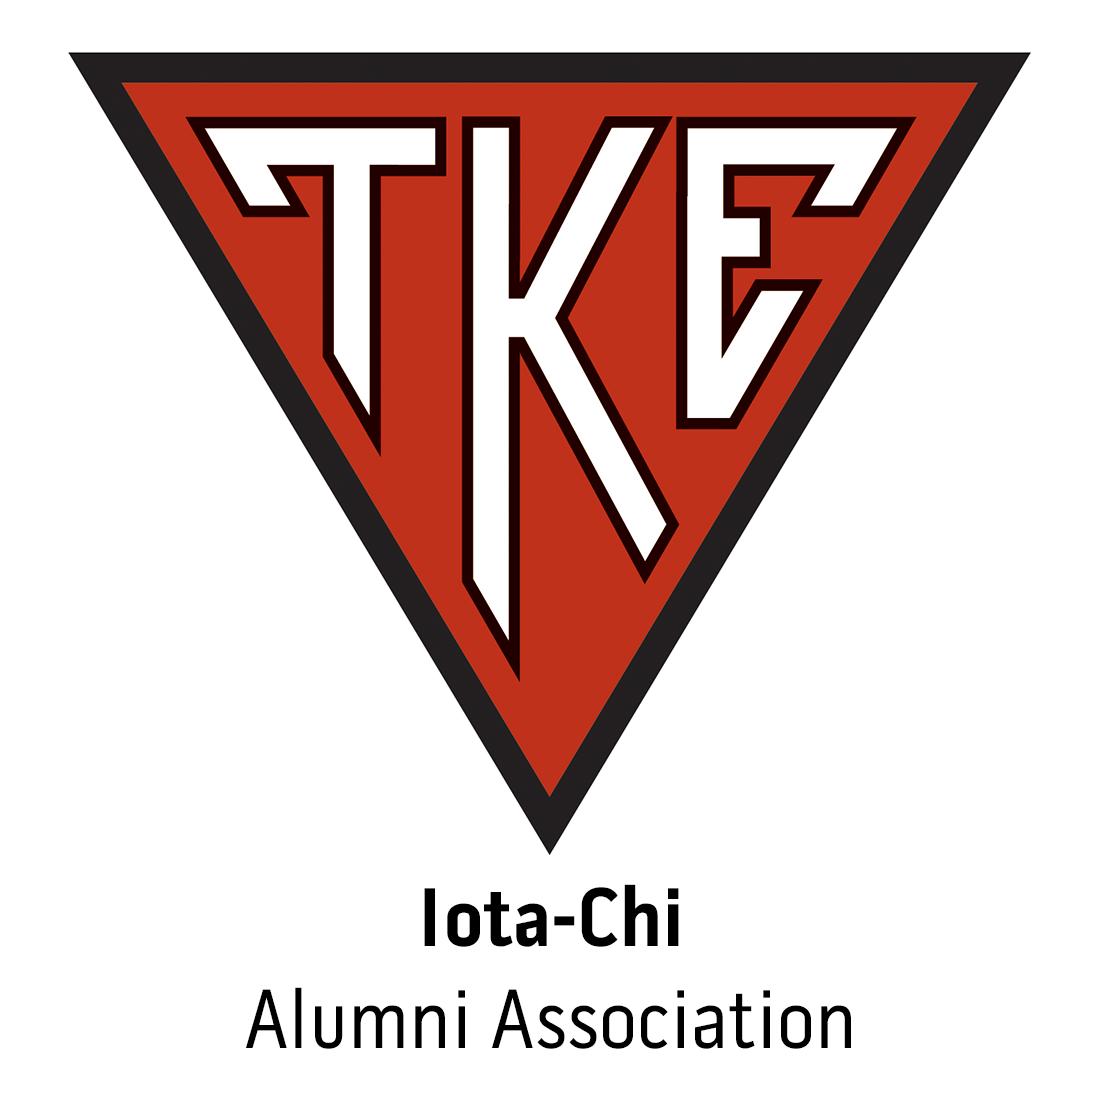 Iota-Chi Alumni Association for New Mexico Highlands University